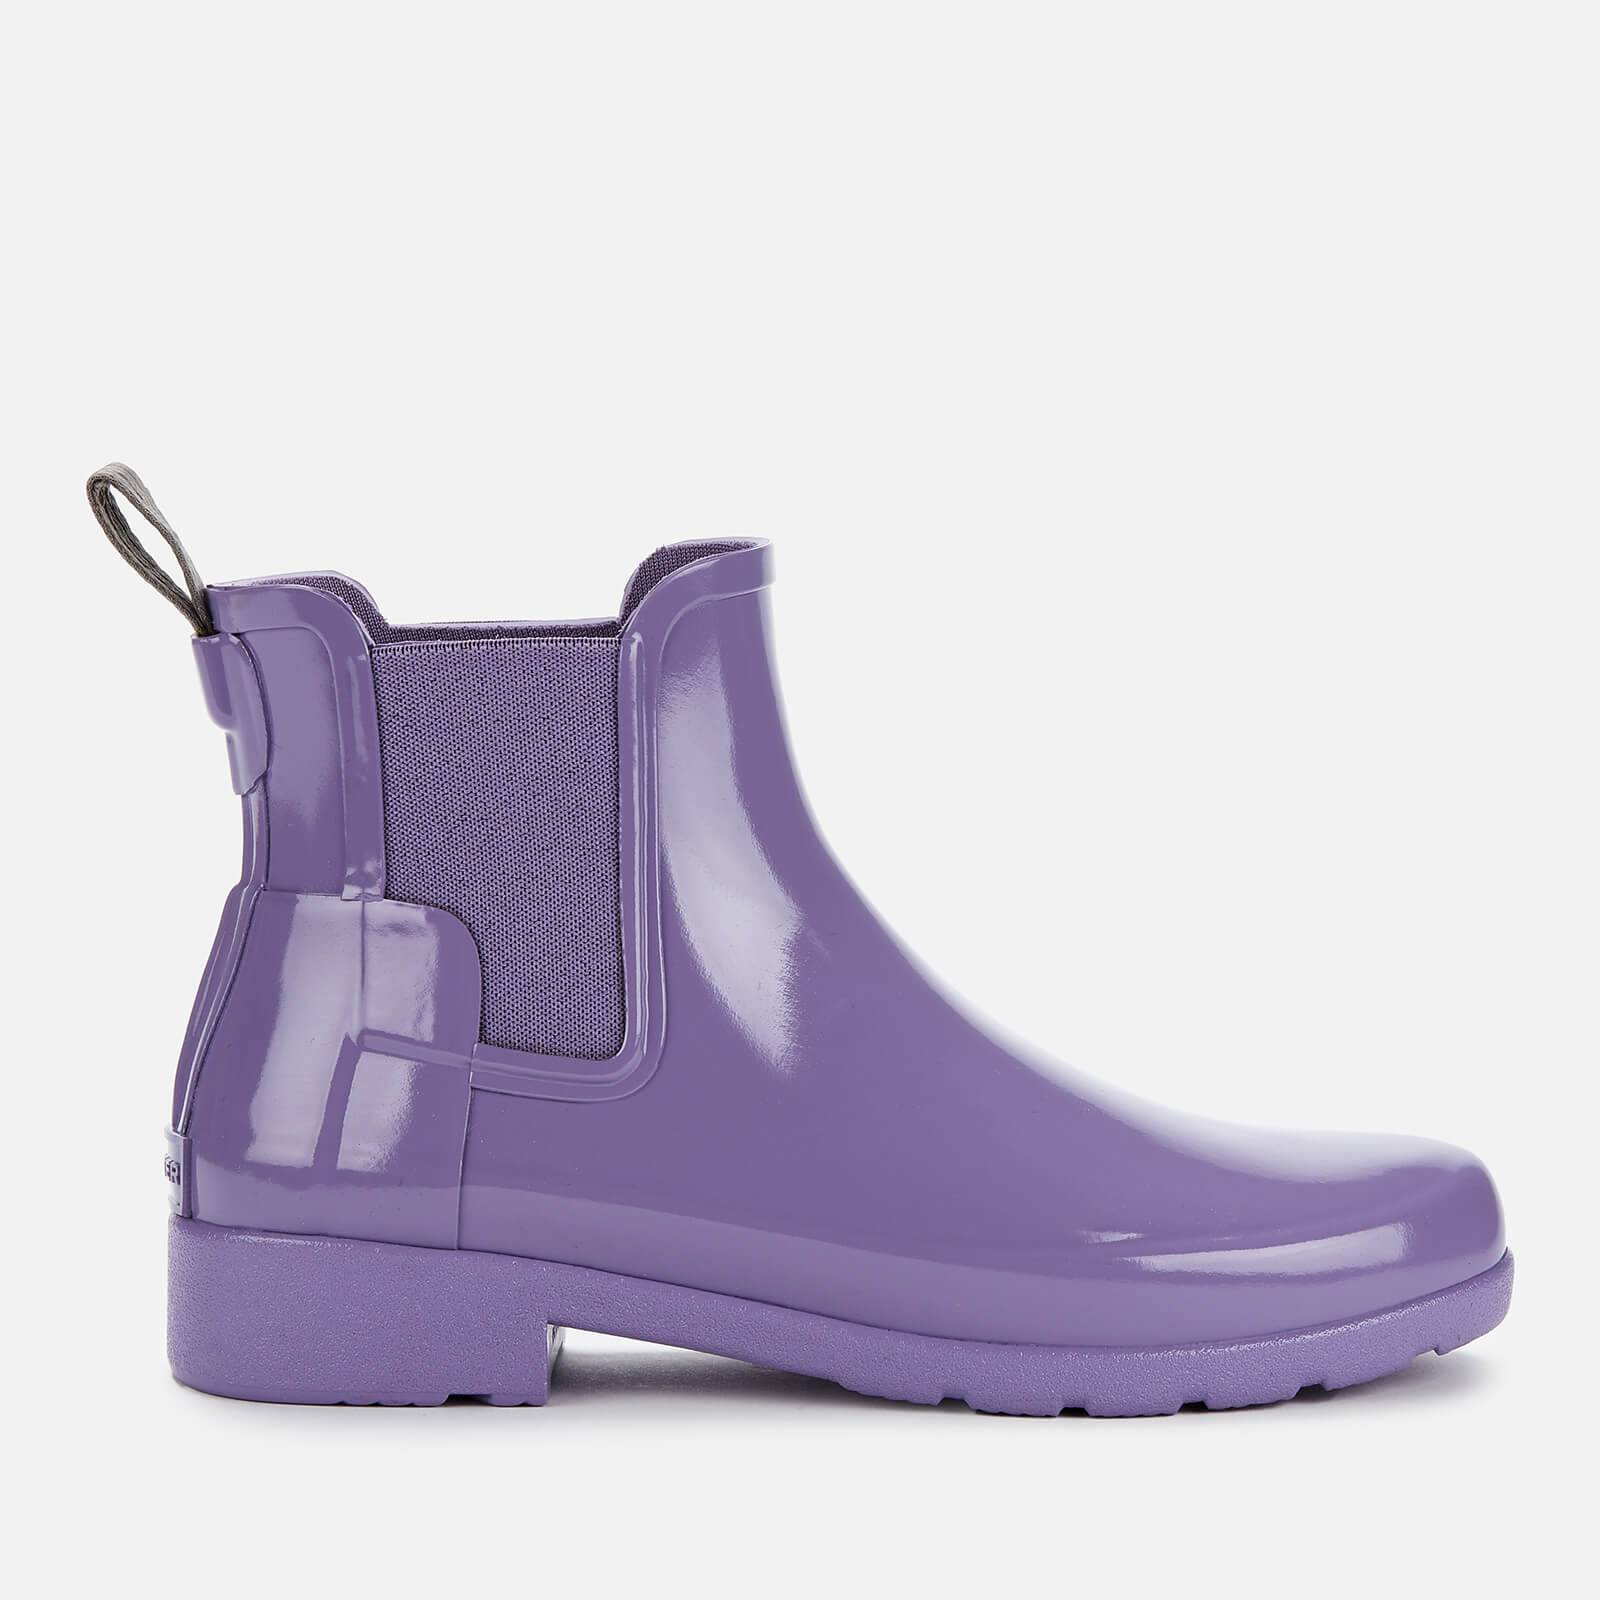 Hunter Women's Original Refined Gloss Chelsea Boots - Parma Violet - UK 5 - Purple